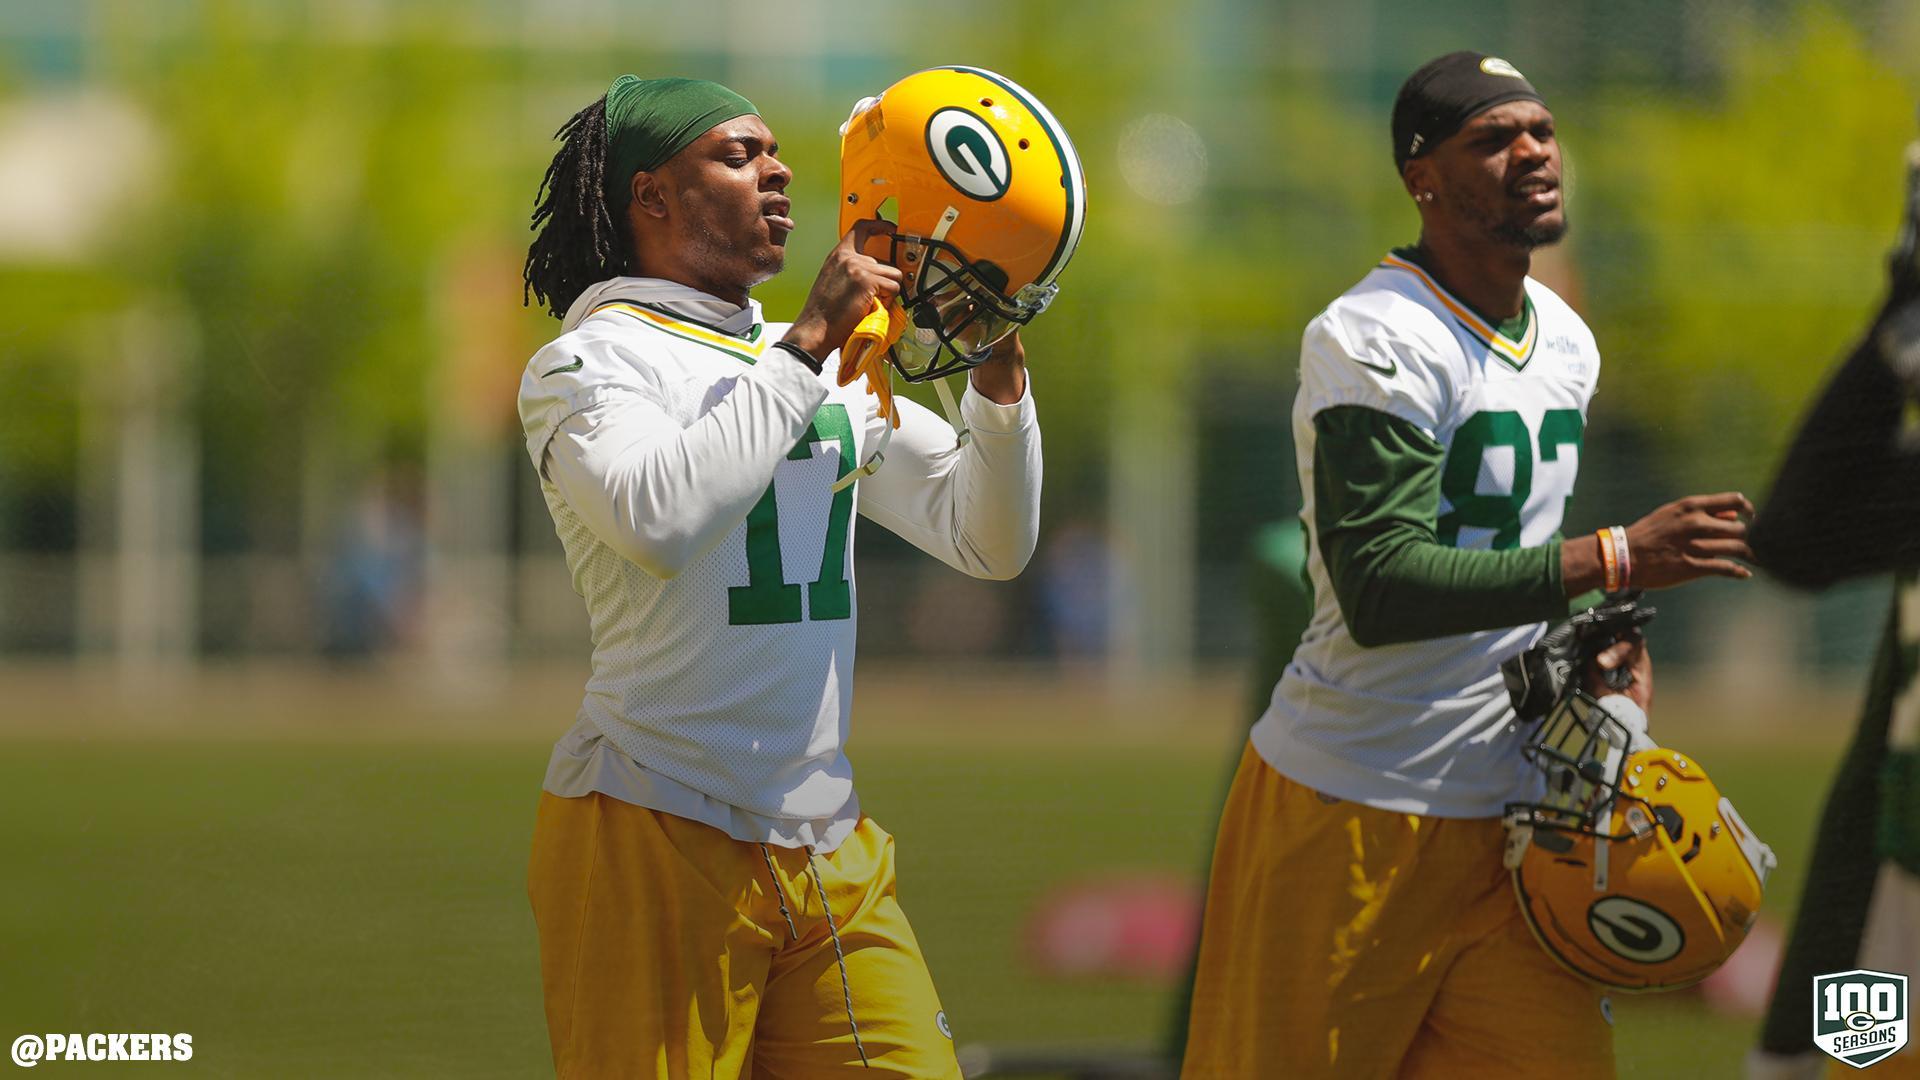 #Packers hit the field for Day 2 of minicamp  ��: https://t.co/AgY3qA7O4n   #GoPackGo https://t.co/3o4ABrIoAr